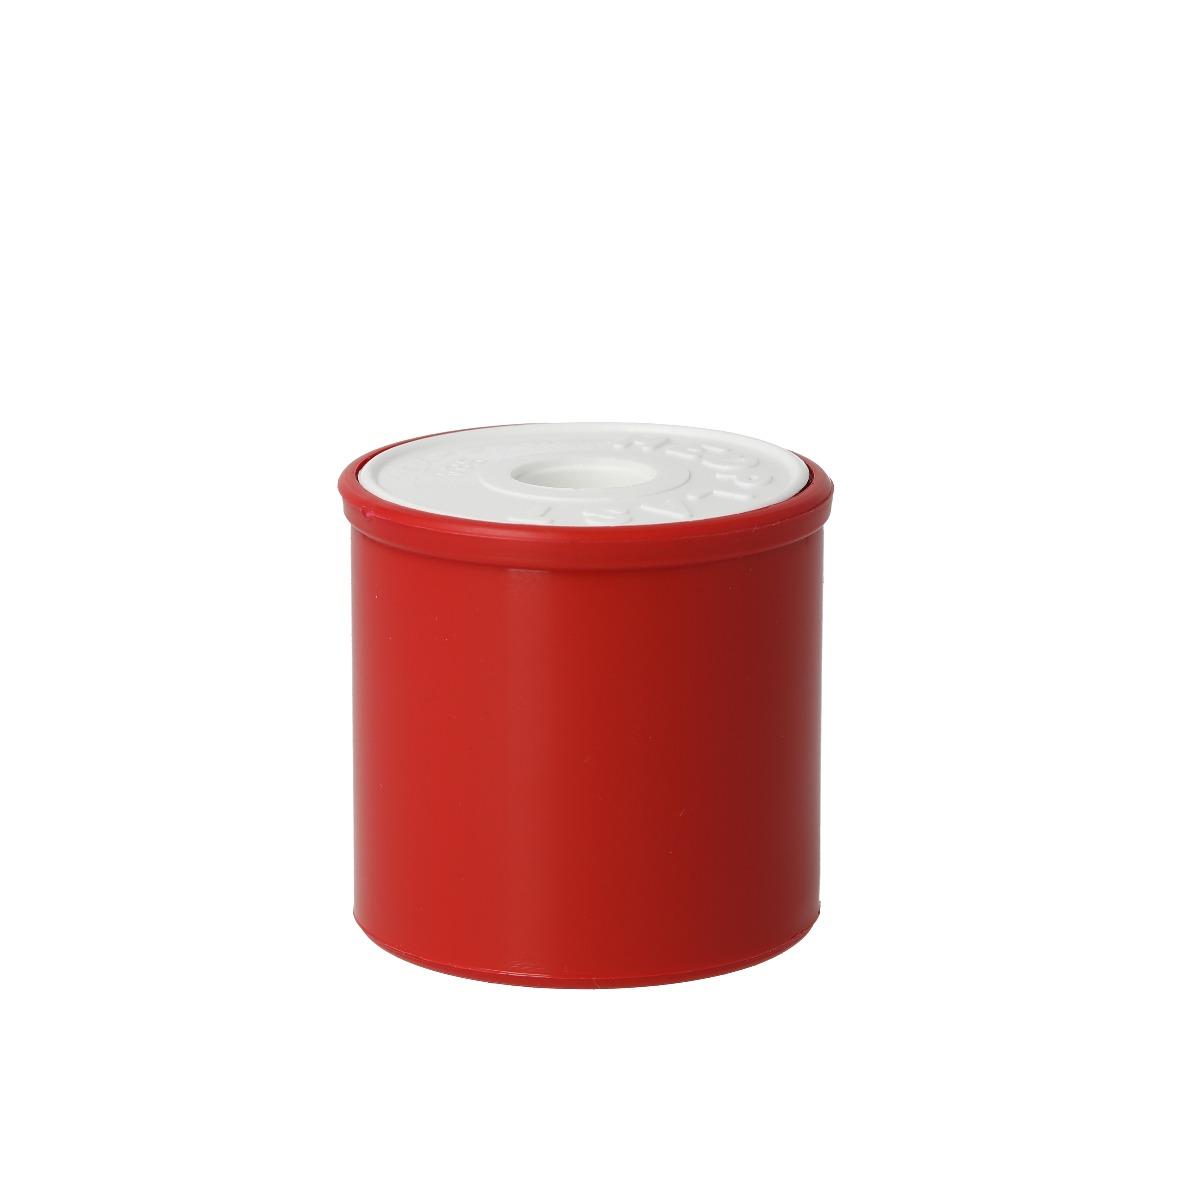 Banda adeziva pentru fixarea pansamentelor, 5cm X 5m, Medplast